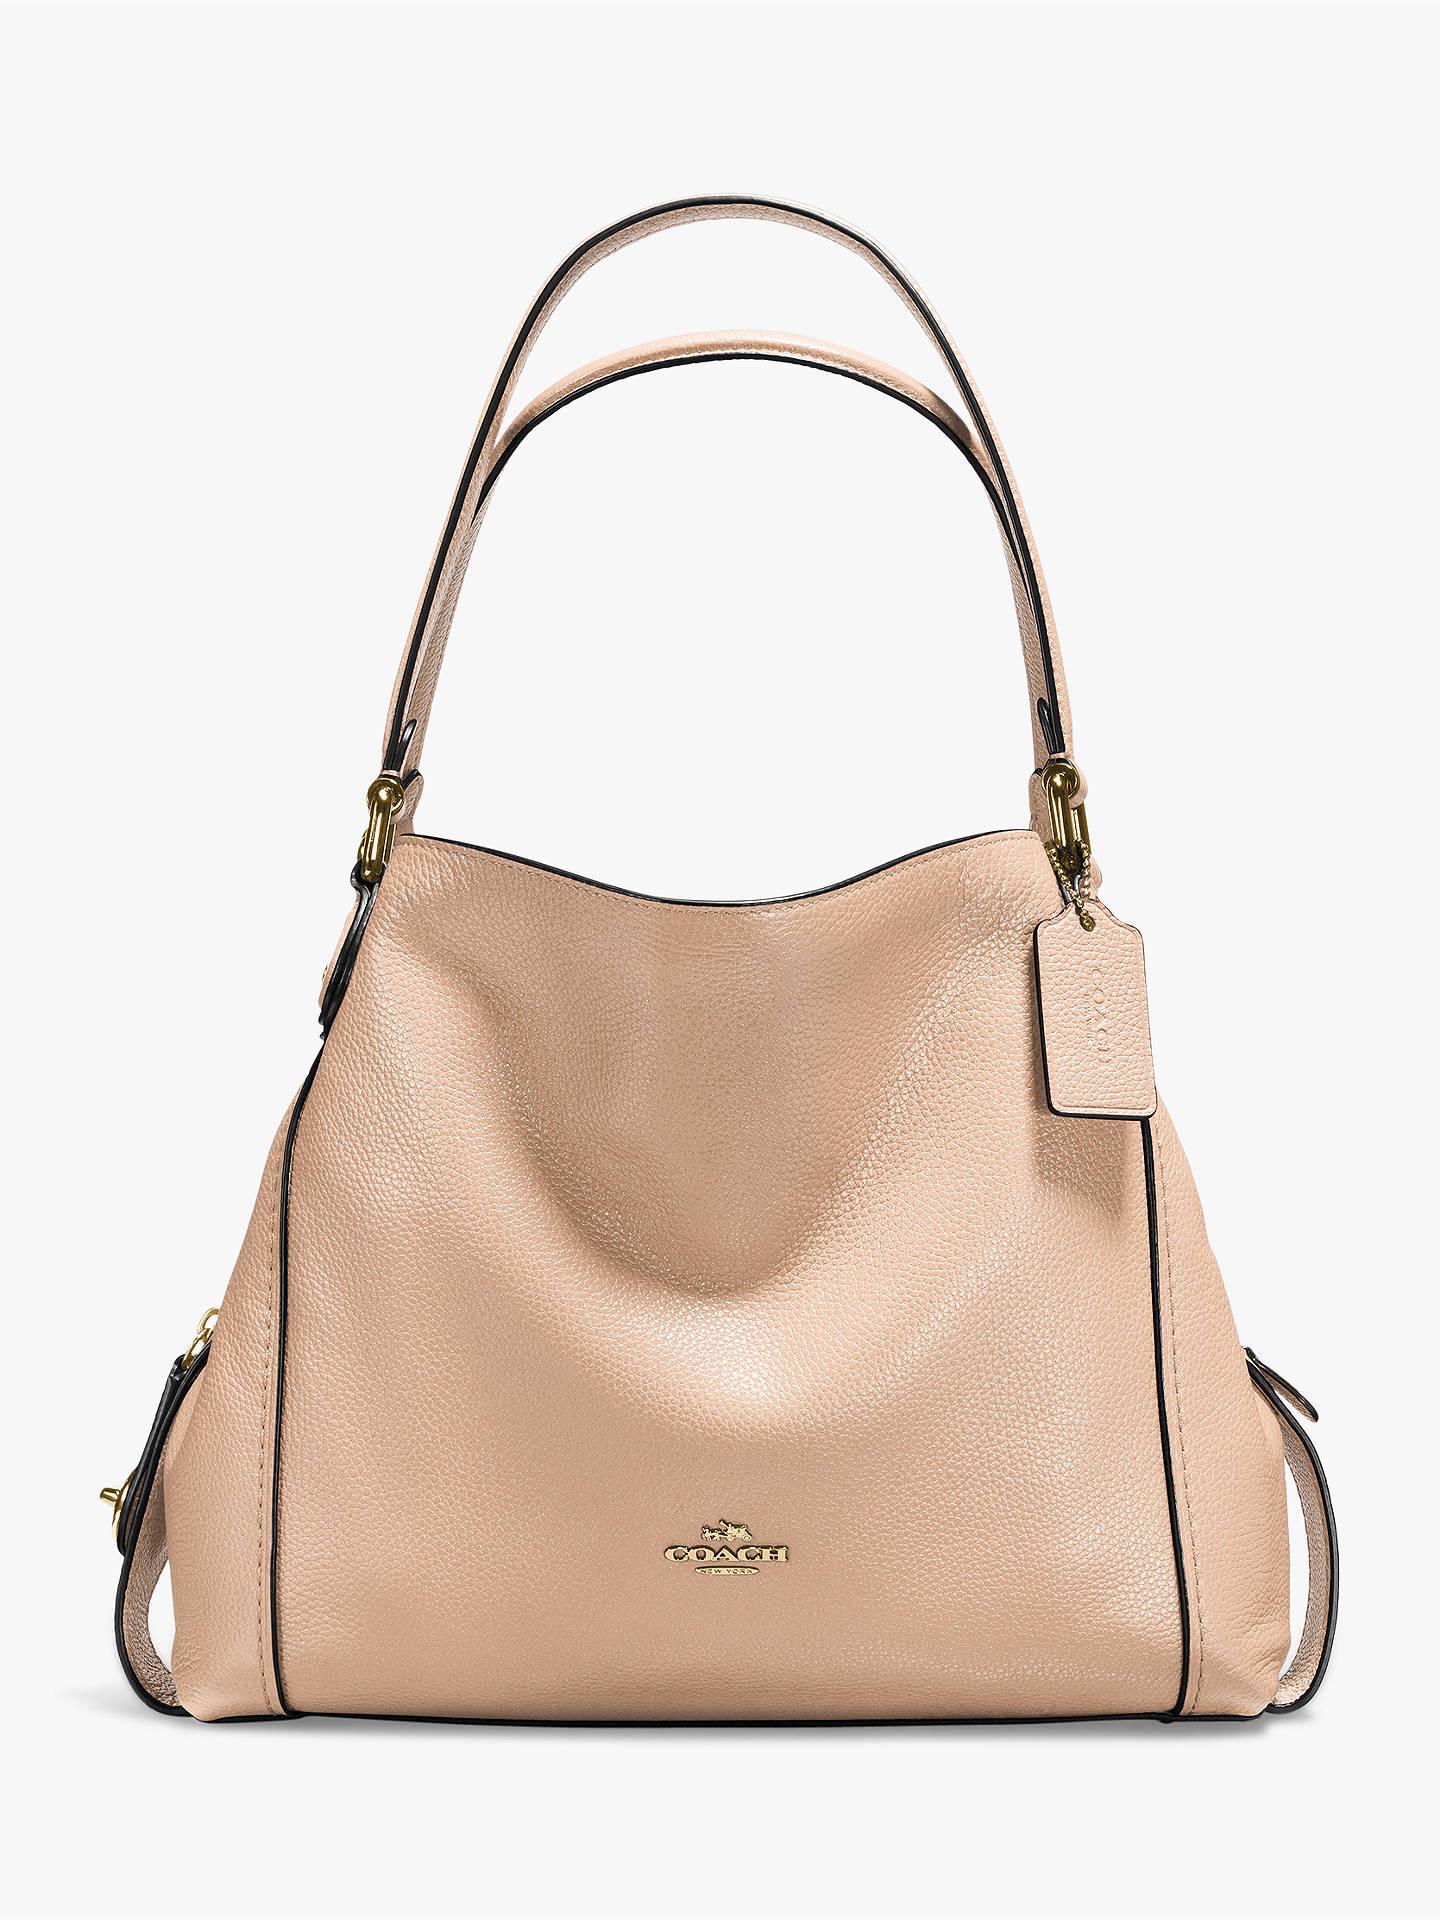 22b61d26f7f64 Coach Edie 31 Polished Pebble Leather Shoulder Bag at John Lewis ...